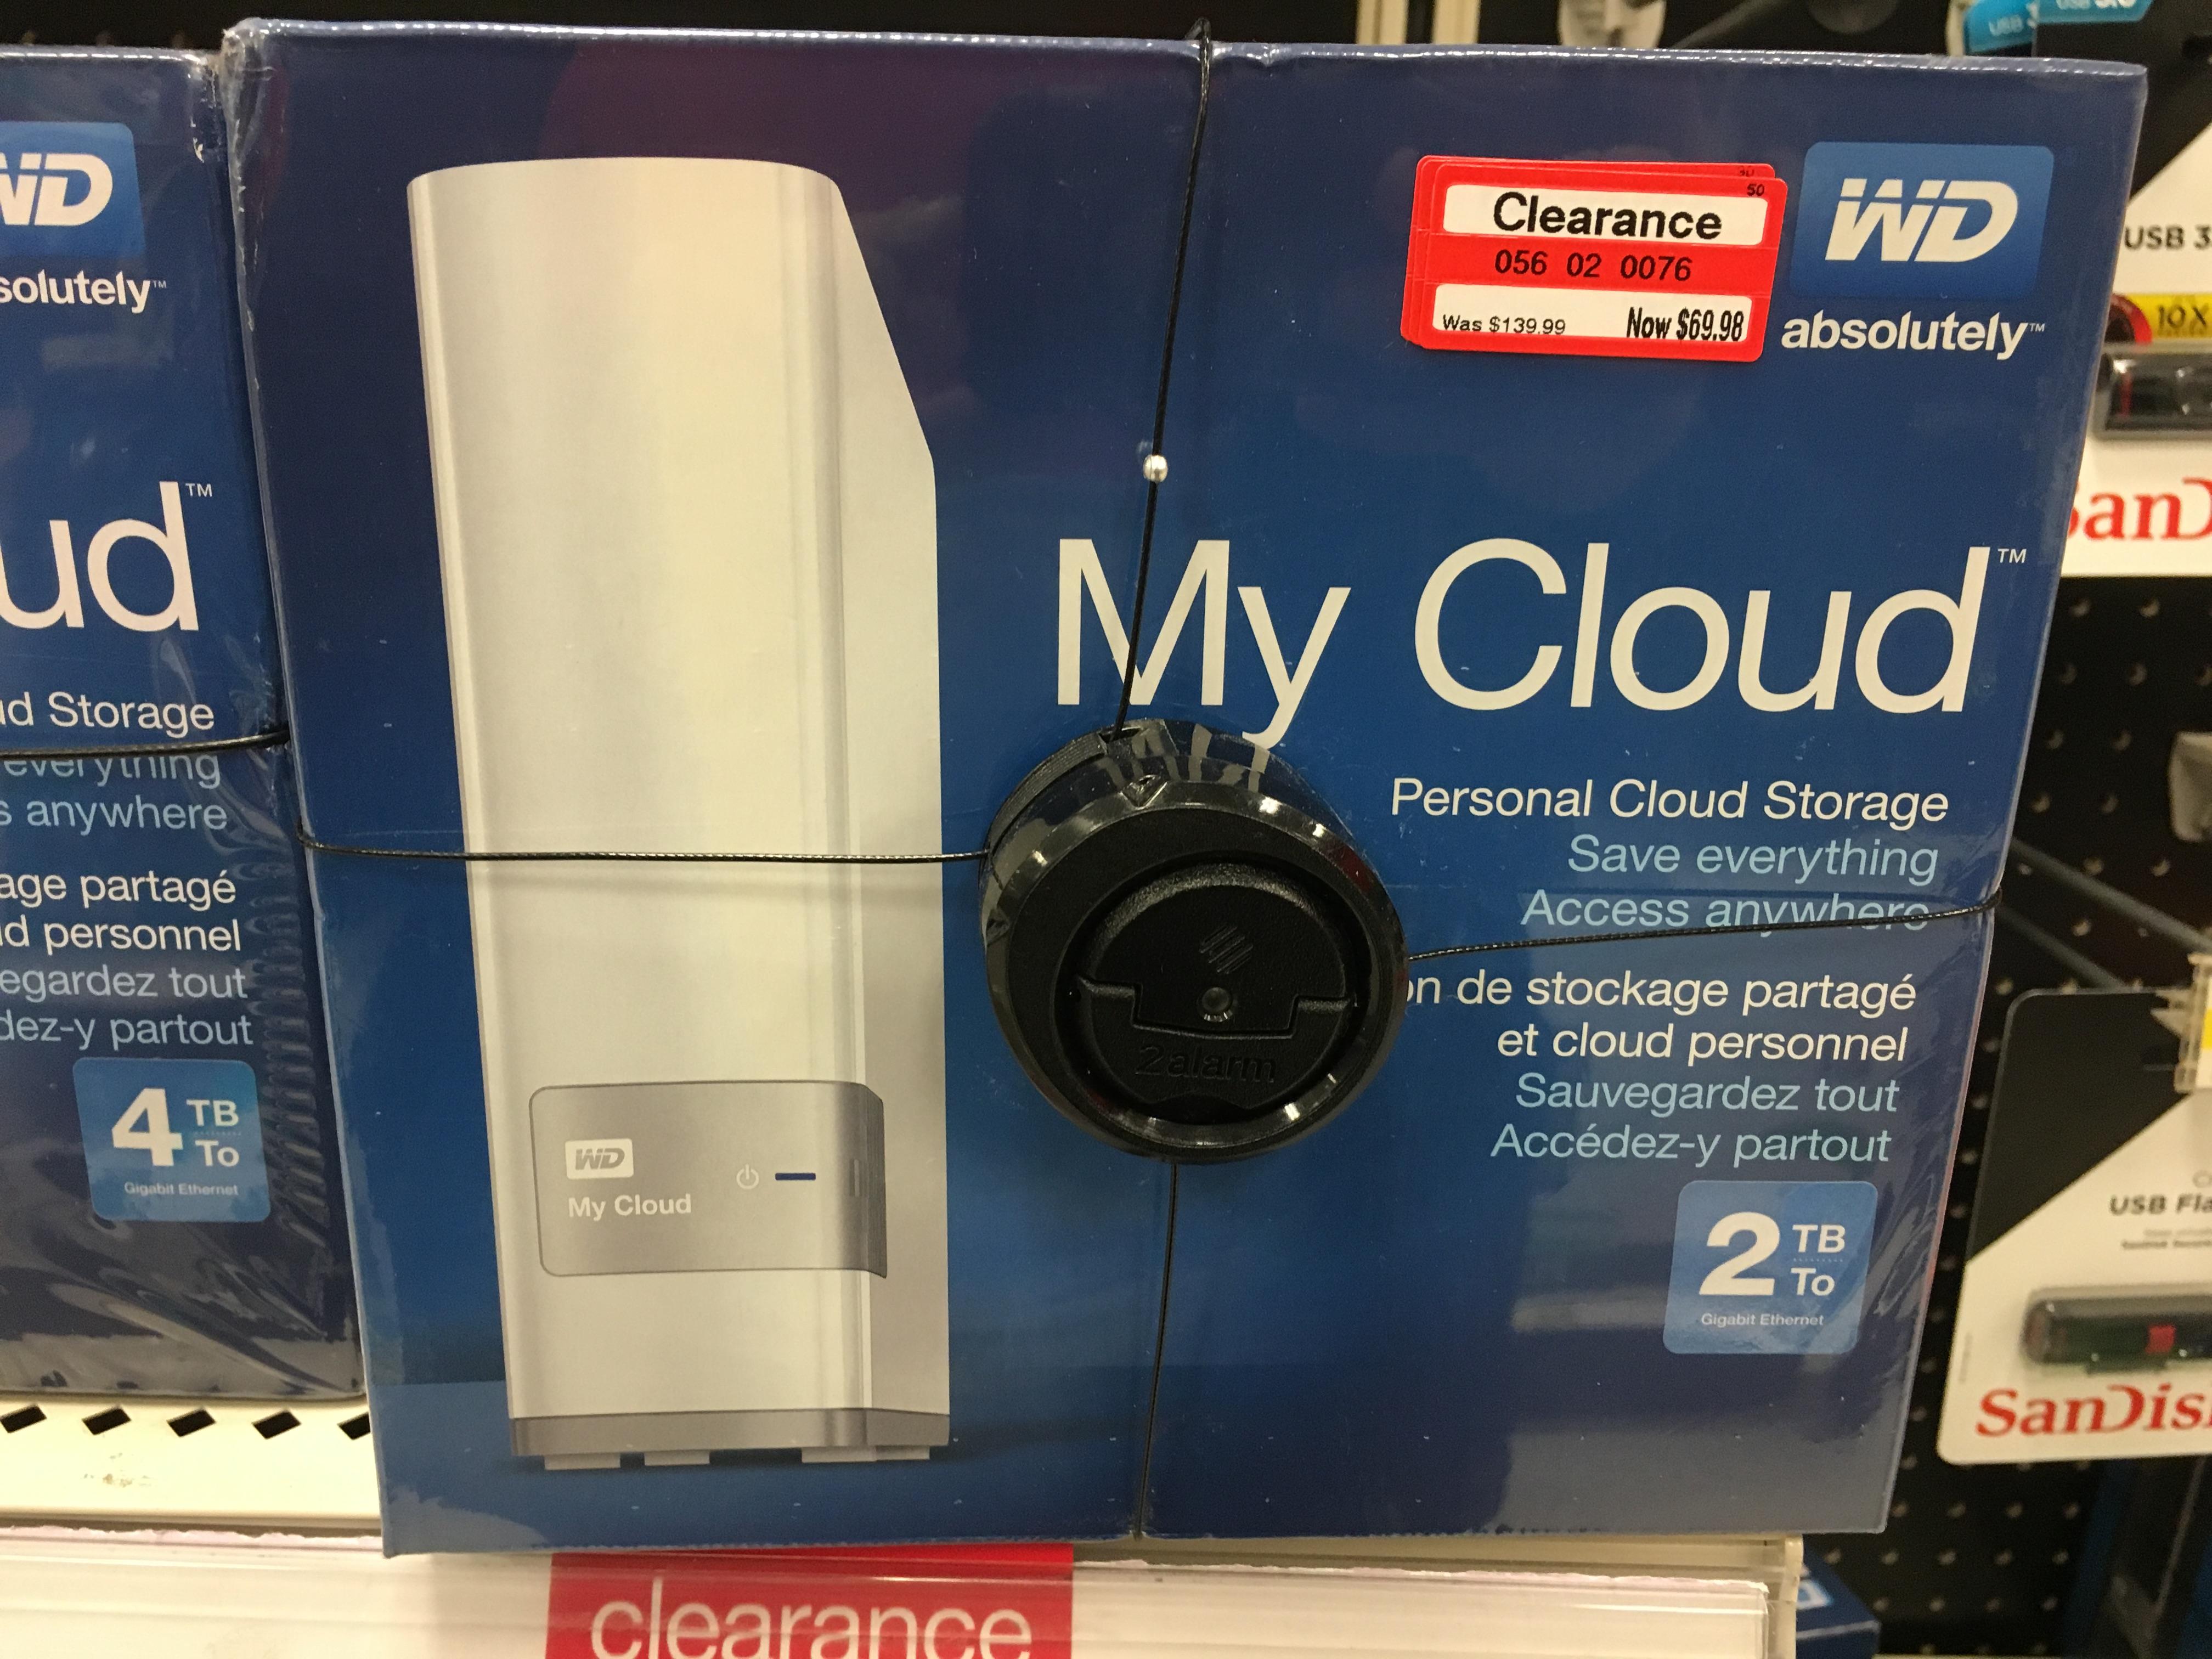 WD 2TB My Cloud Personal Cloud Storage at Target $69.98 YMMV B&M